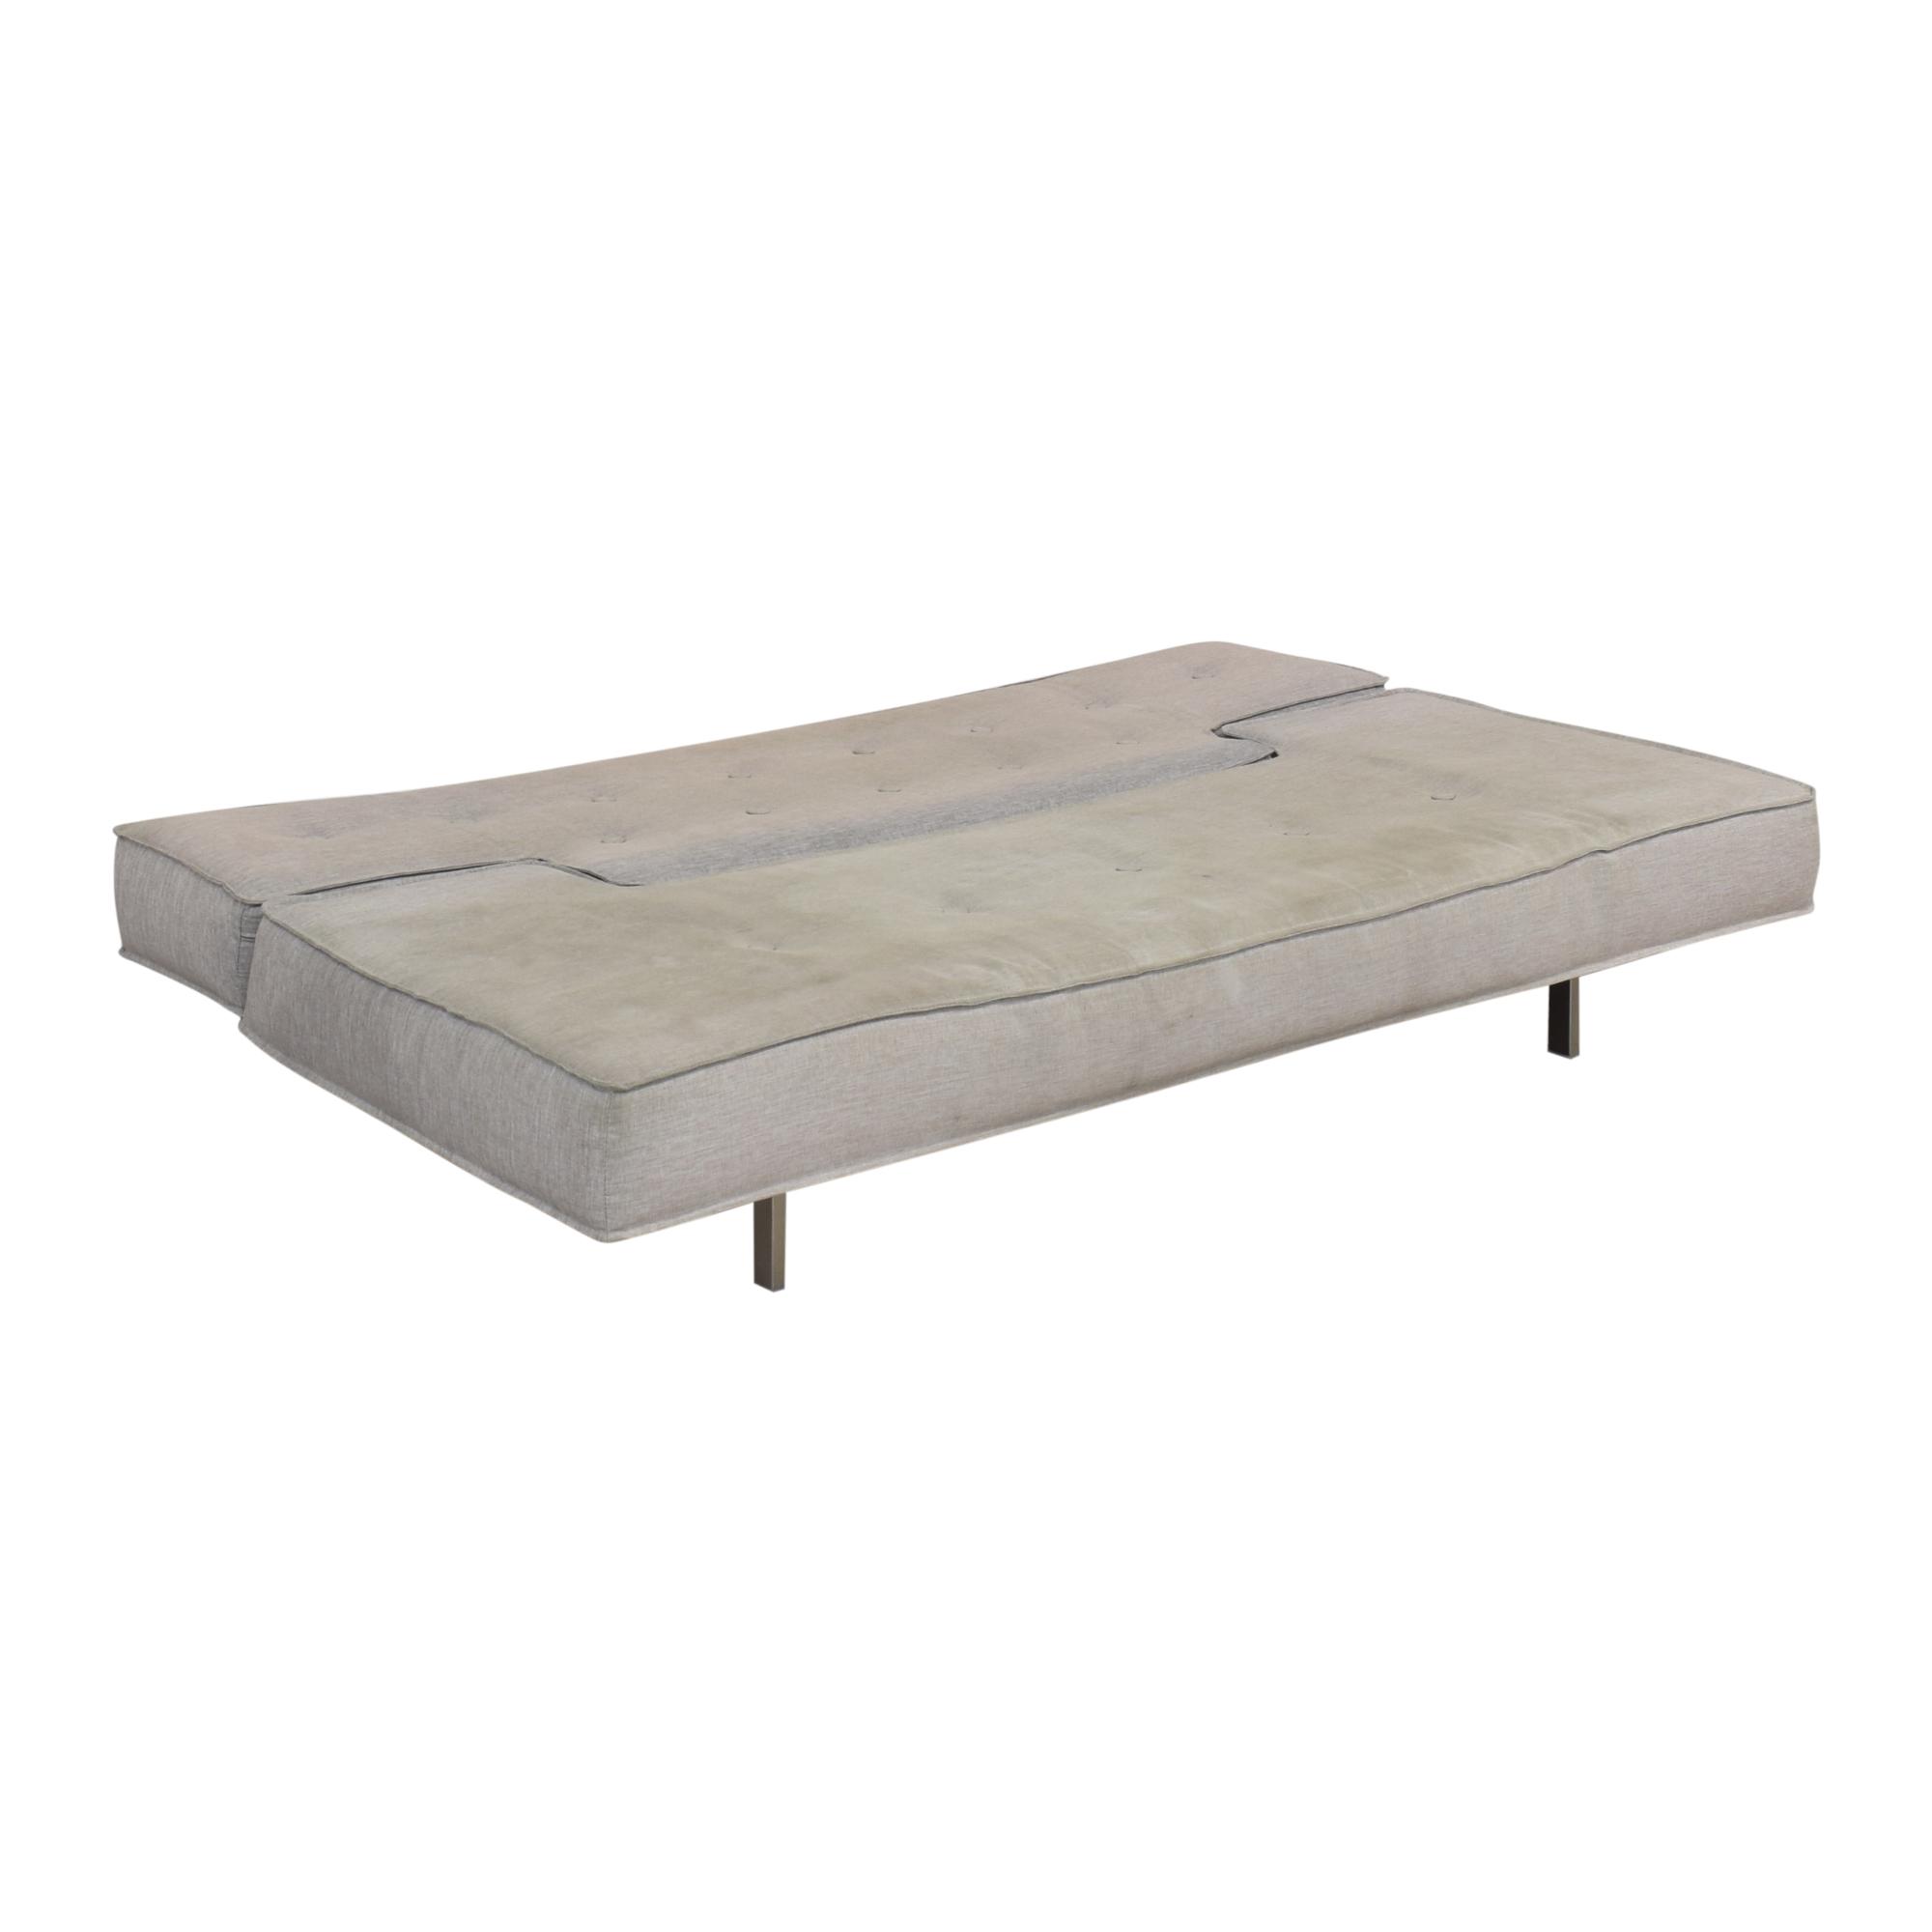 BoConcept BoConcept Seca Sofa Bed Classic Sofas